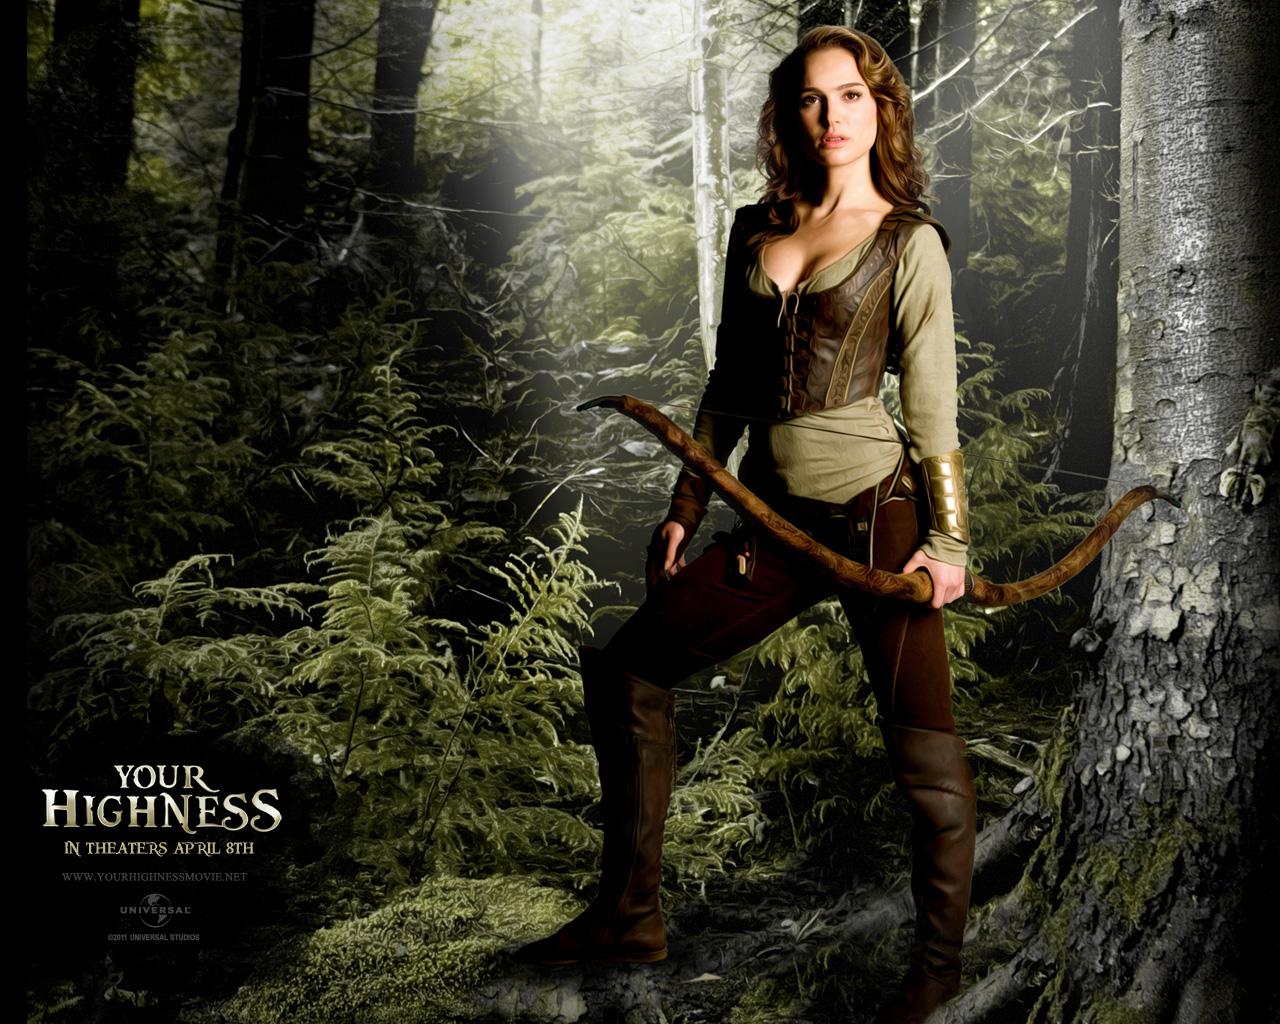 Natalie Portman in Your Highness Wallpaper | Prateak Movie ... Natalie Portman Wikipedia